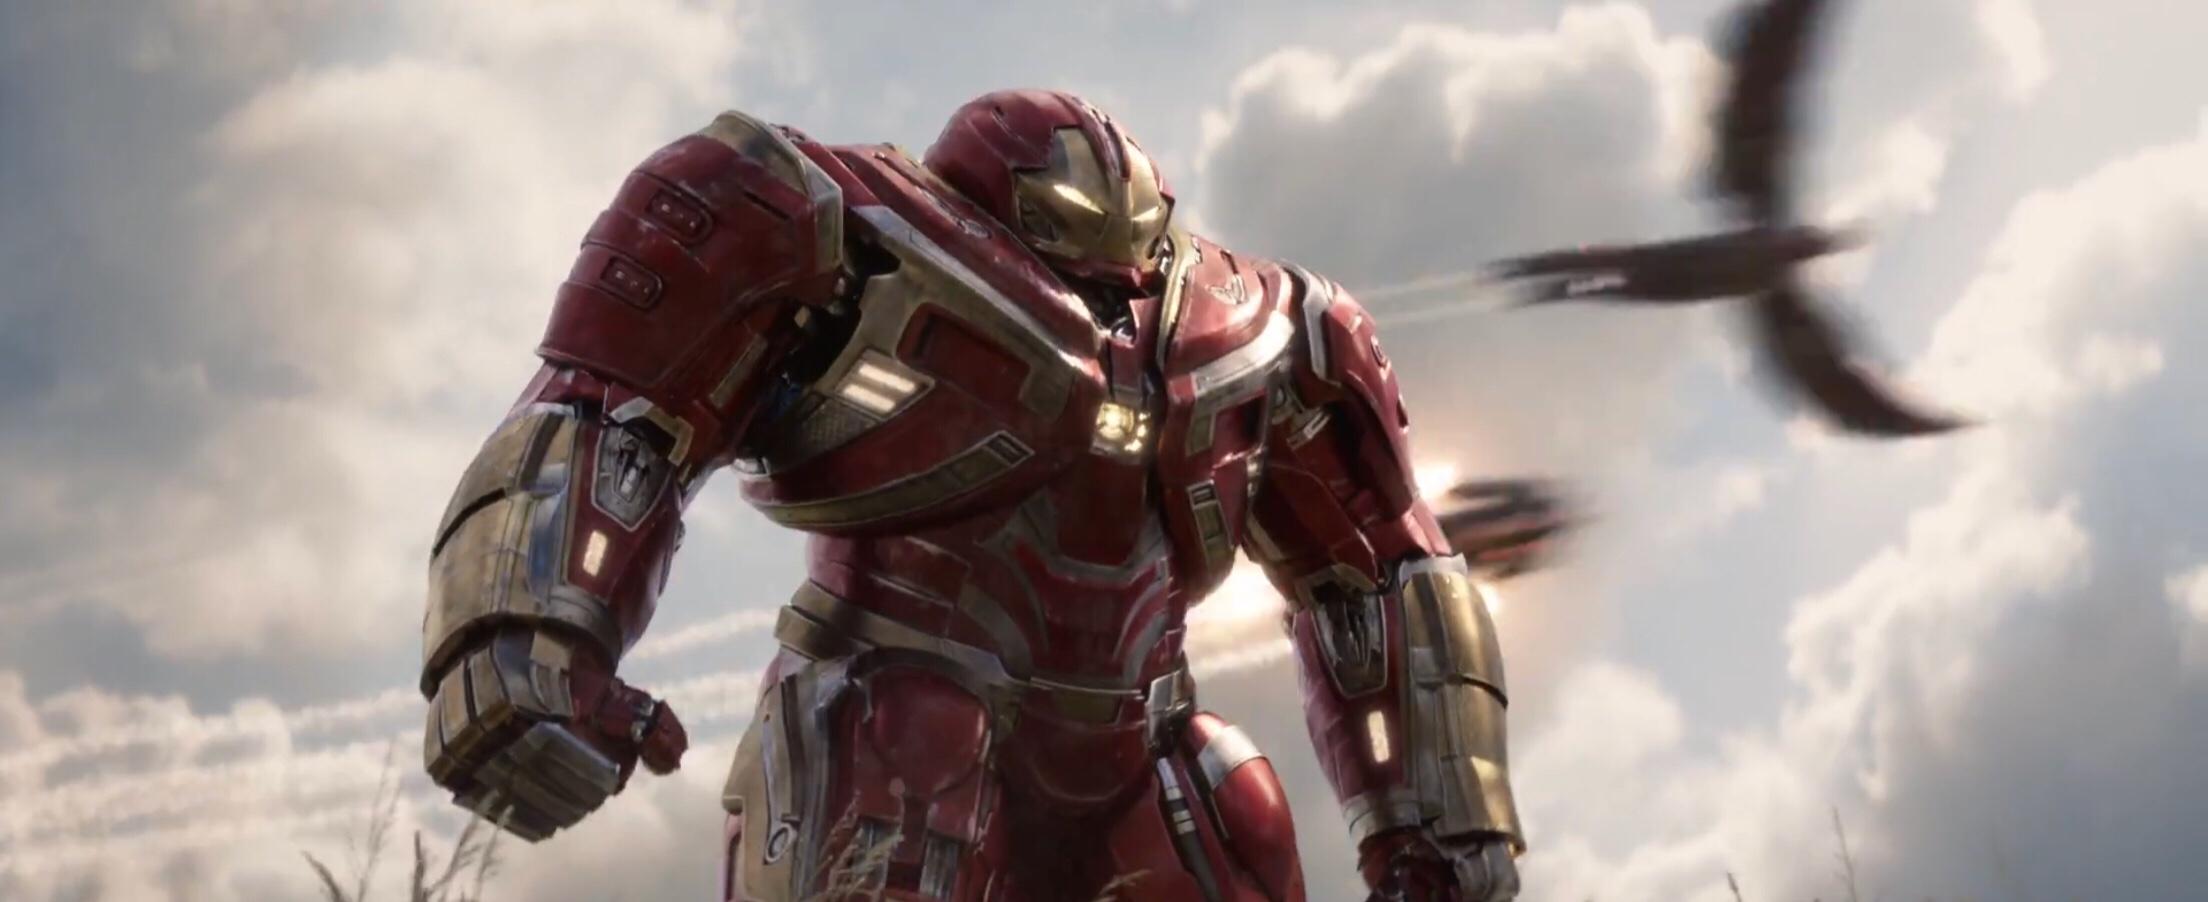 hulkbuster in avengers infinity war